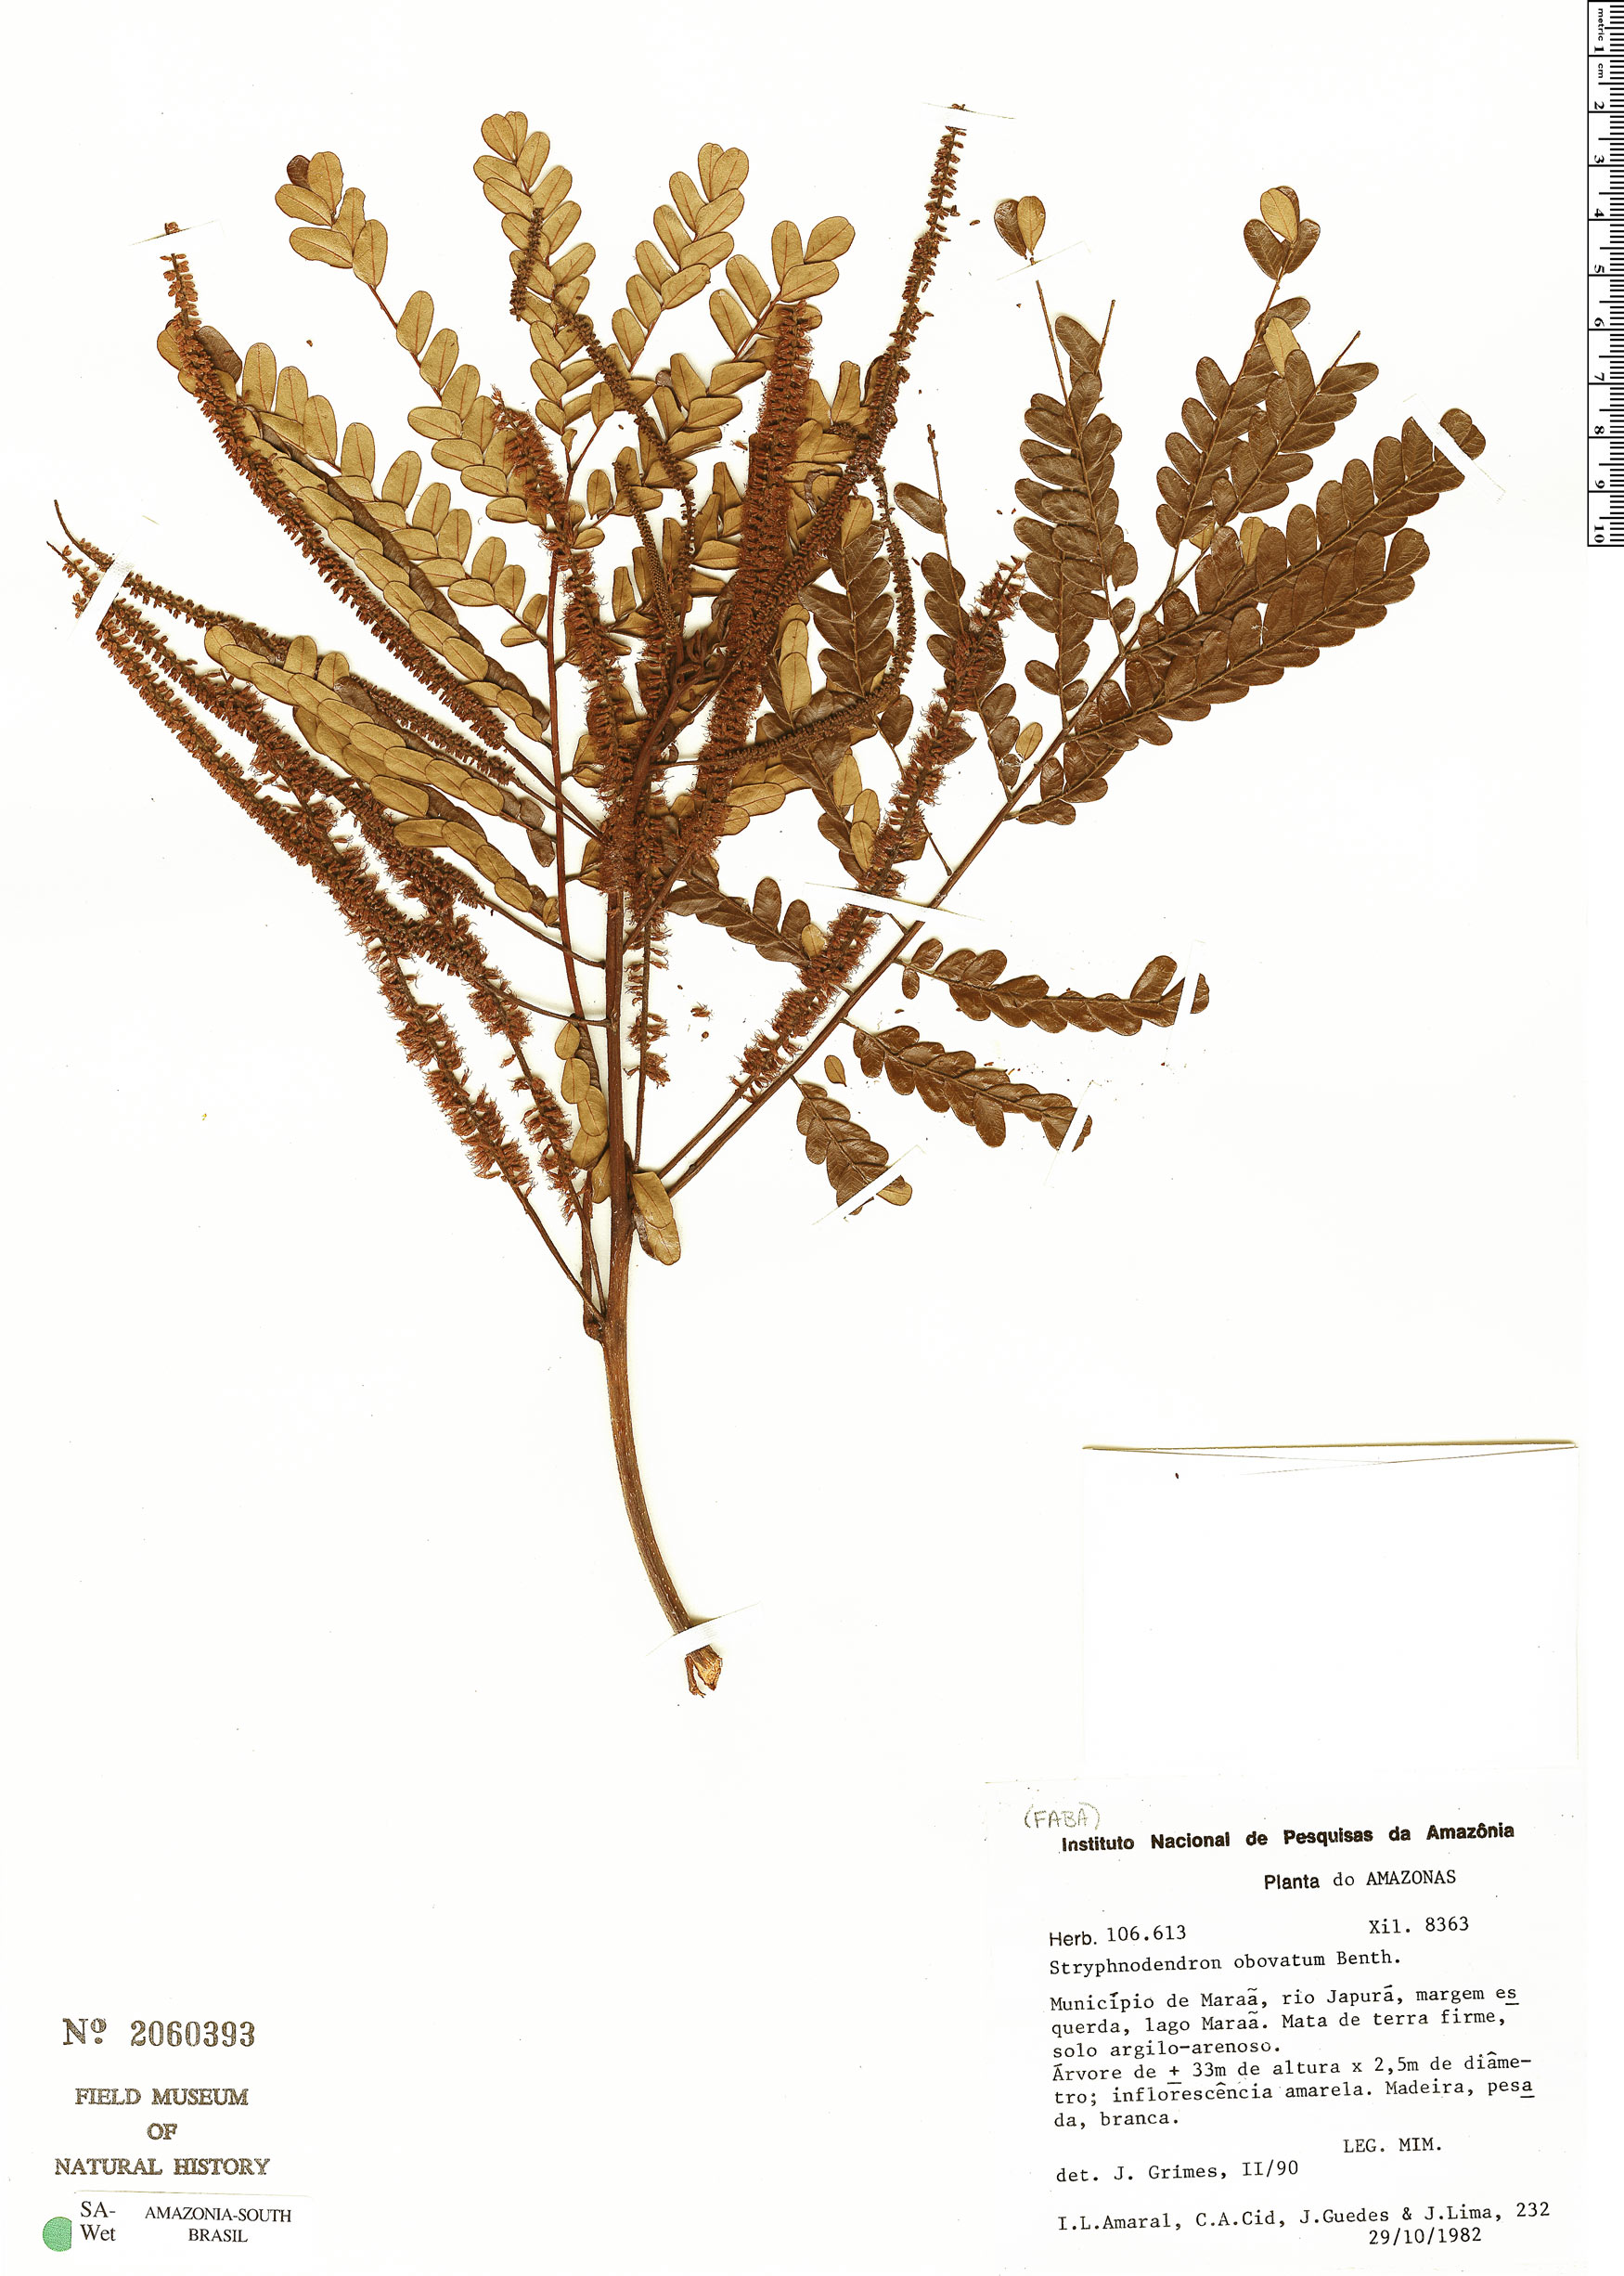 Espécime: Stryphnodendron obovatum